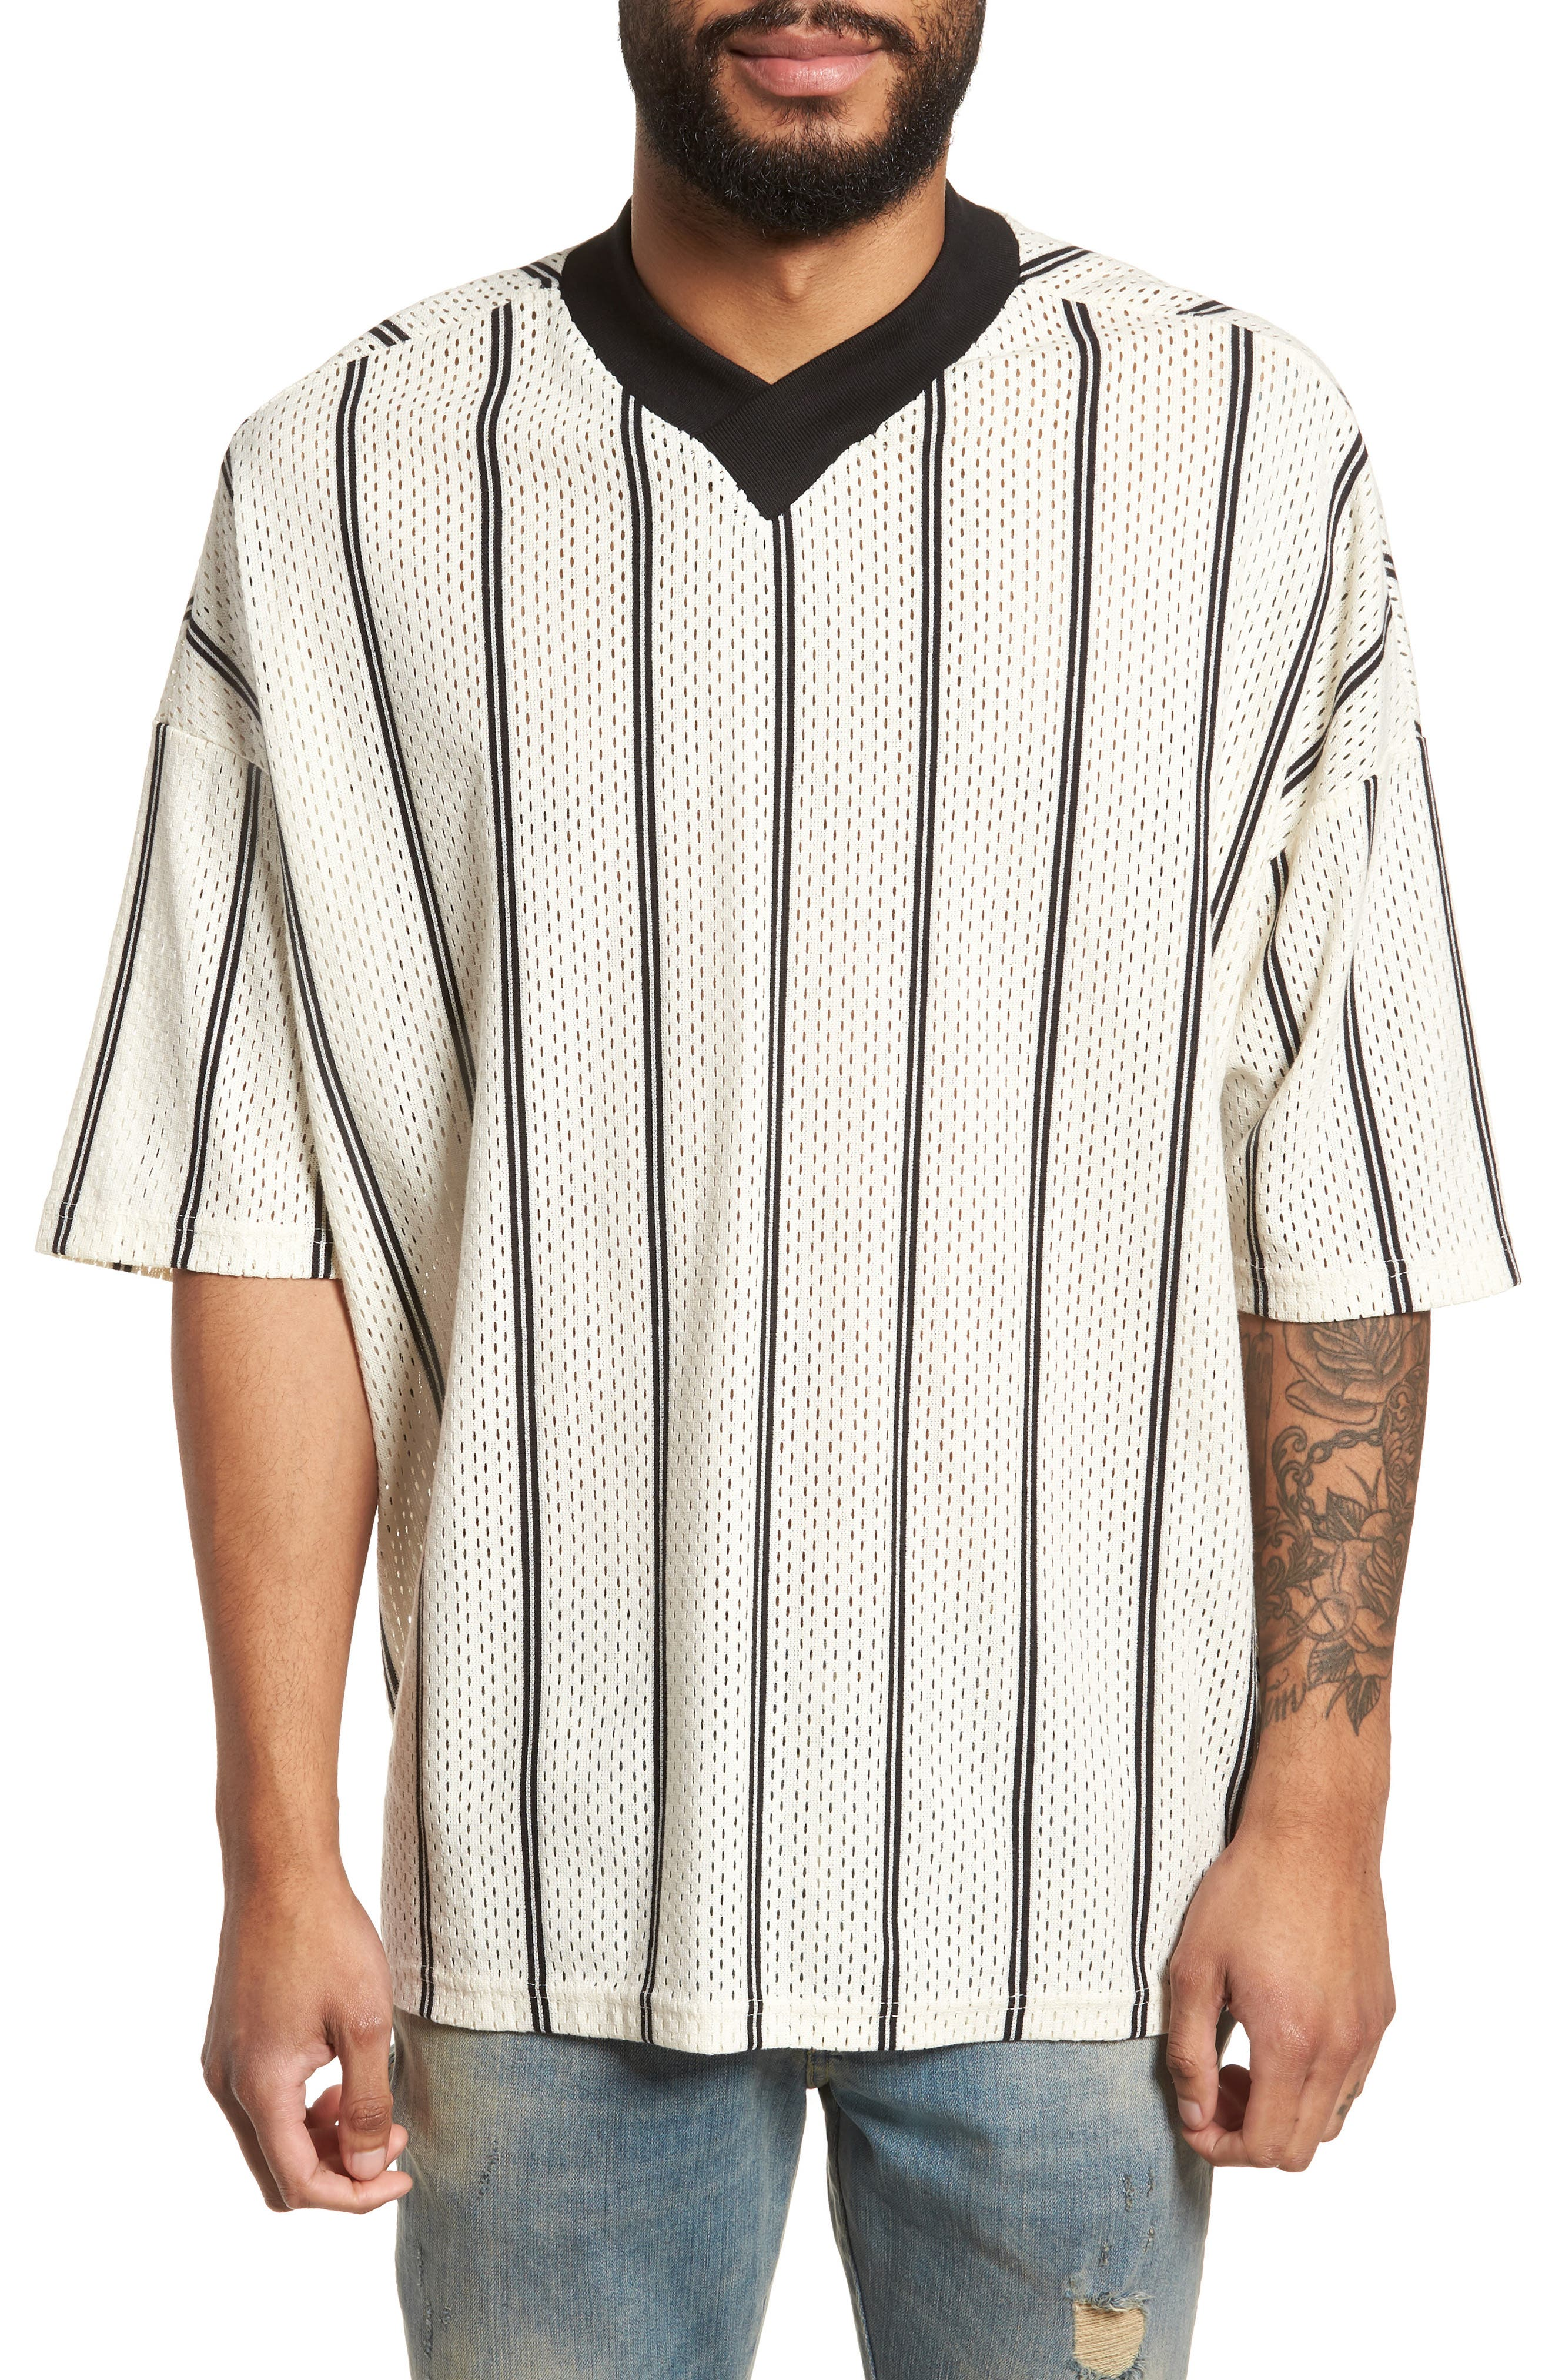 Represent Mesh T-Shirt